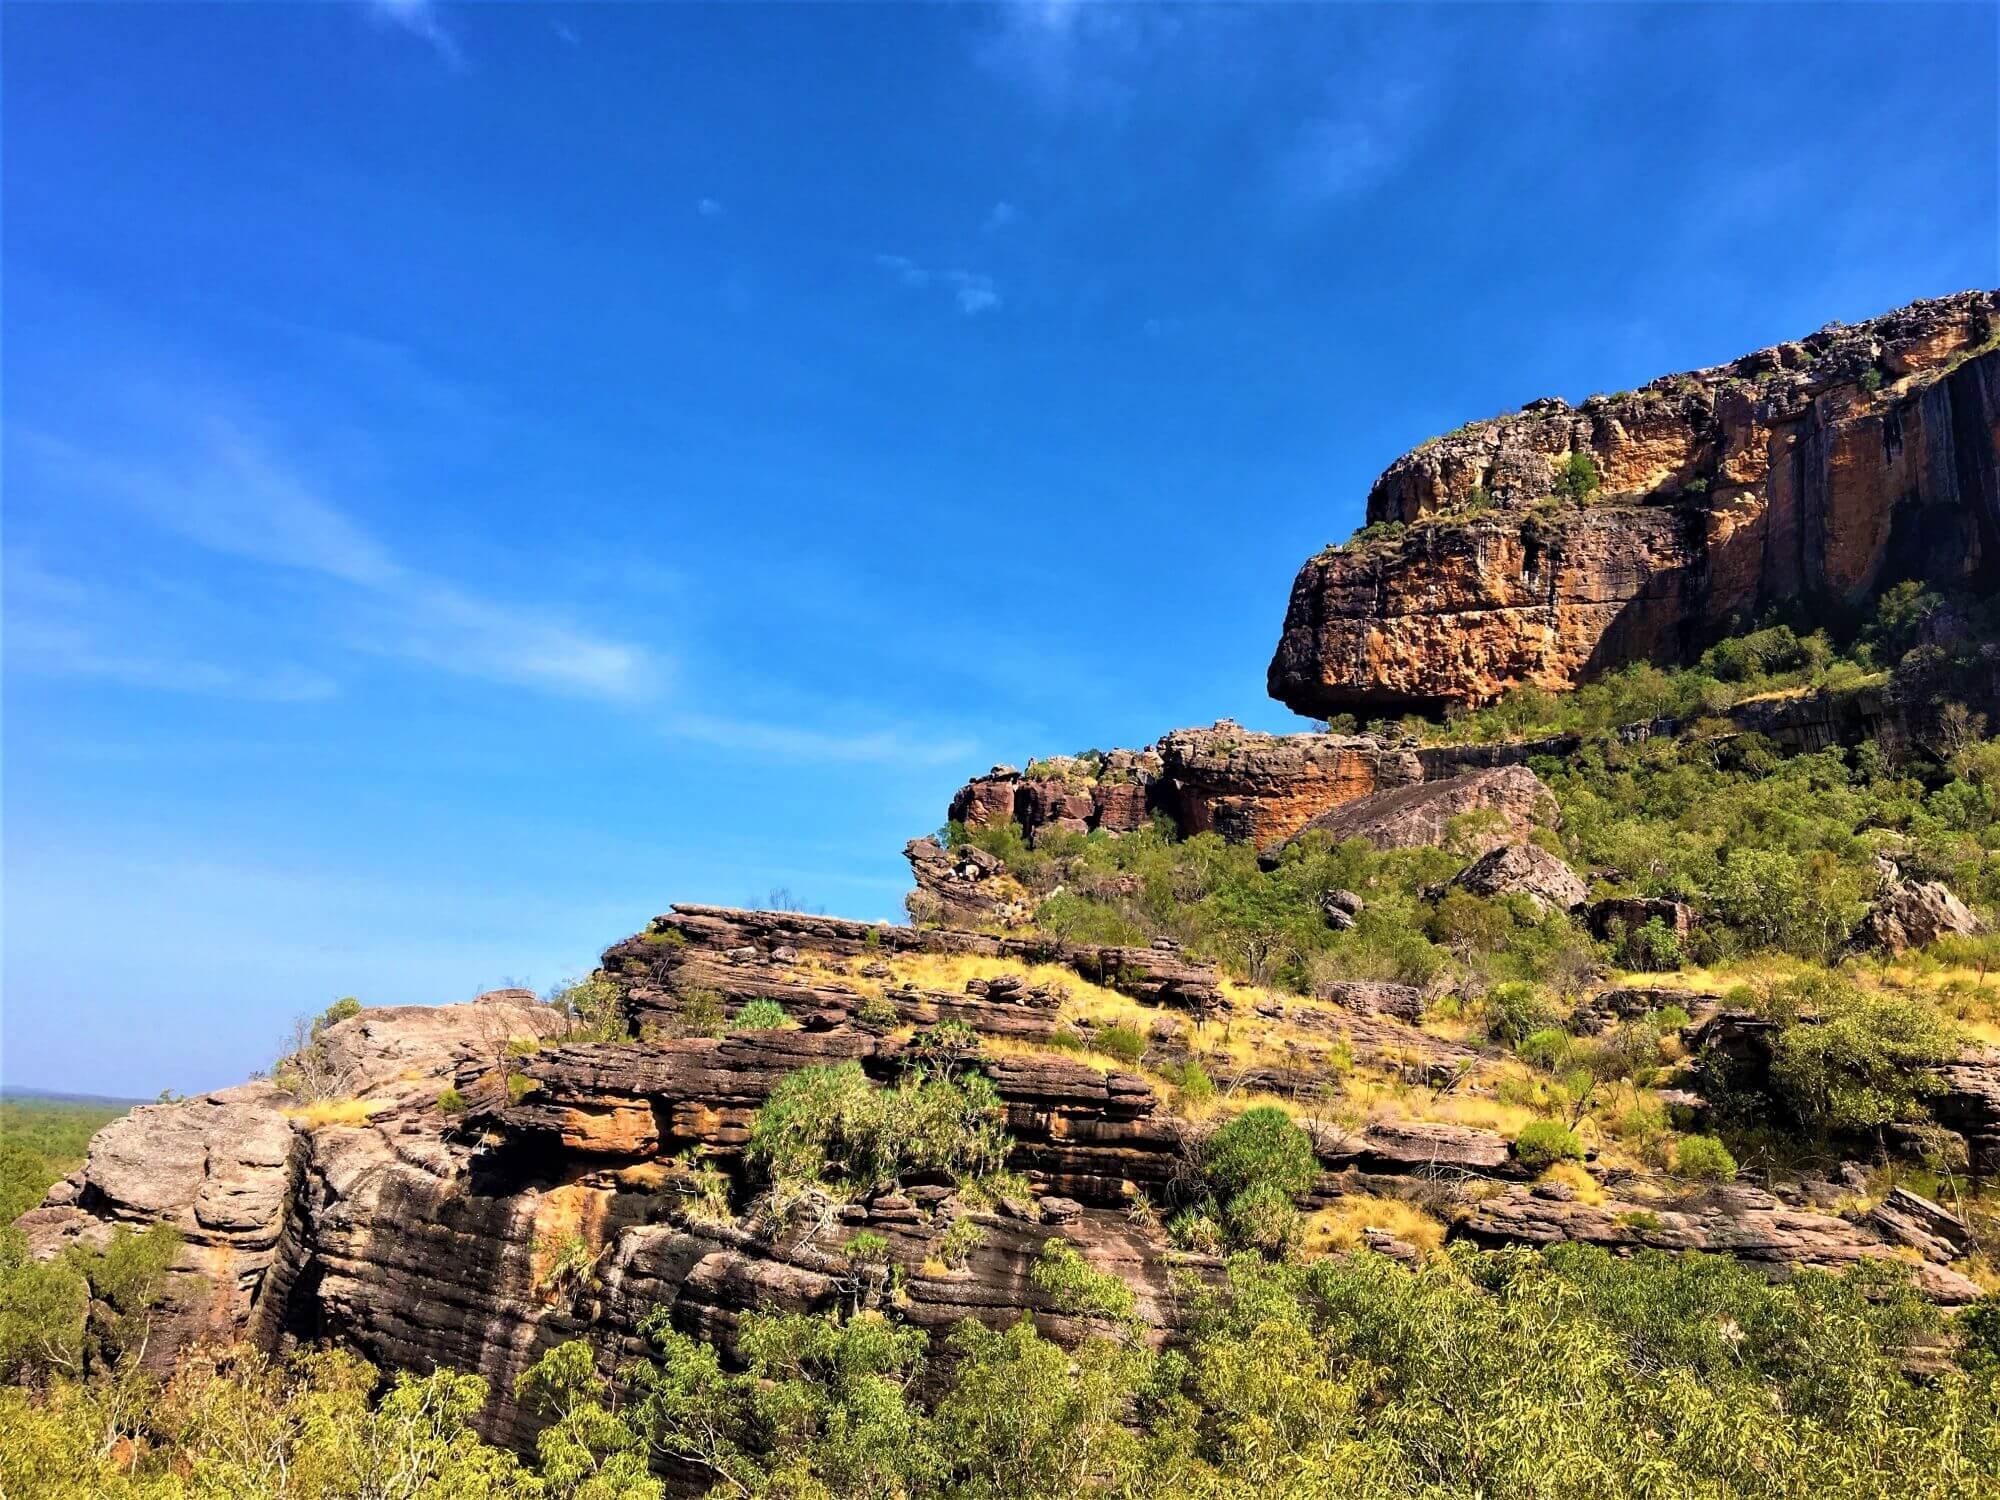 Sehenswürdigkeit im Kakadu National Park - Großer Fels Nourlangie Rock